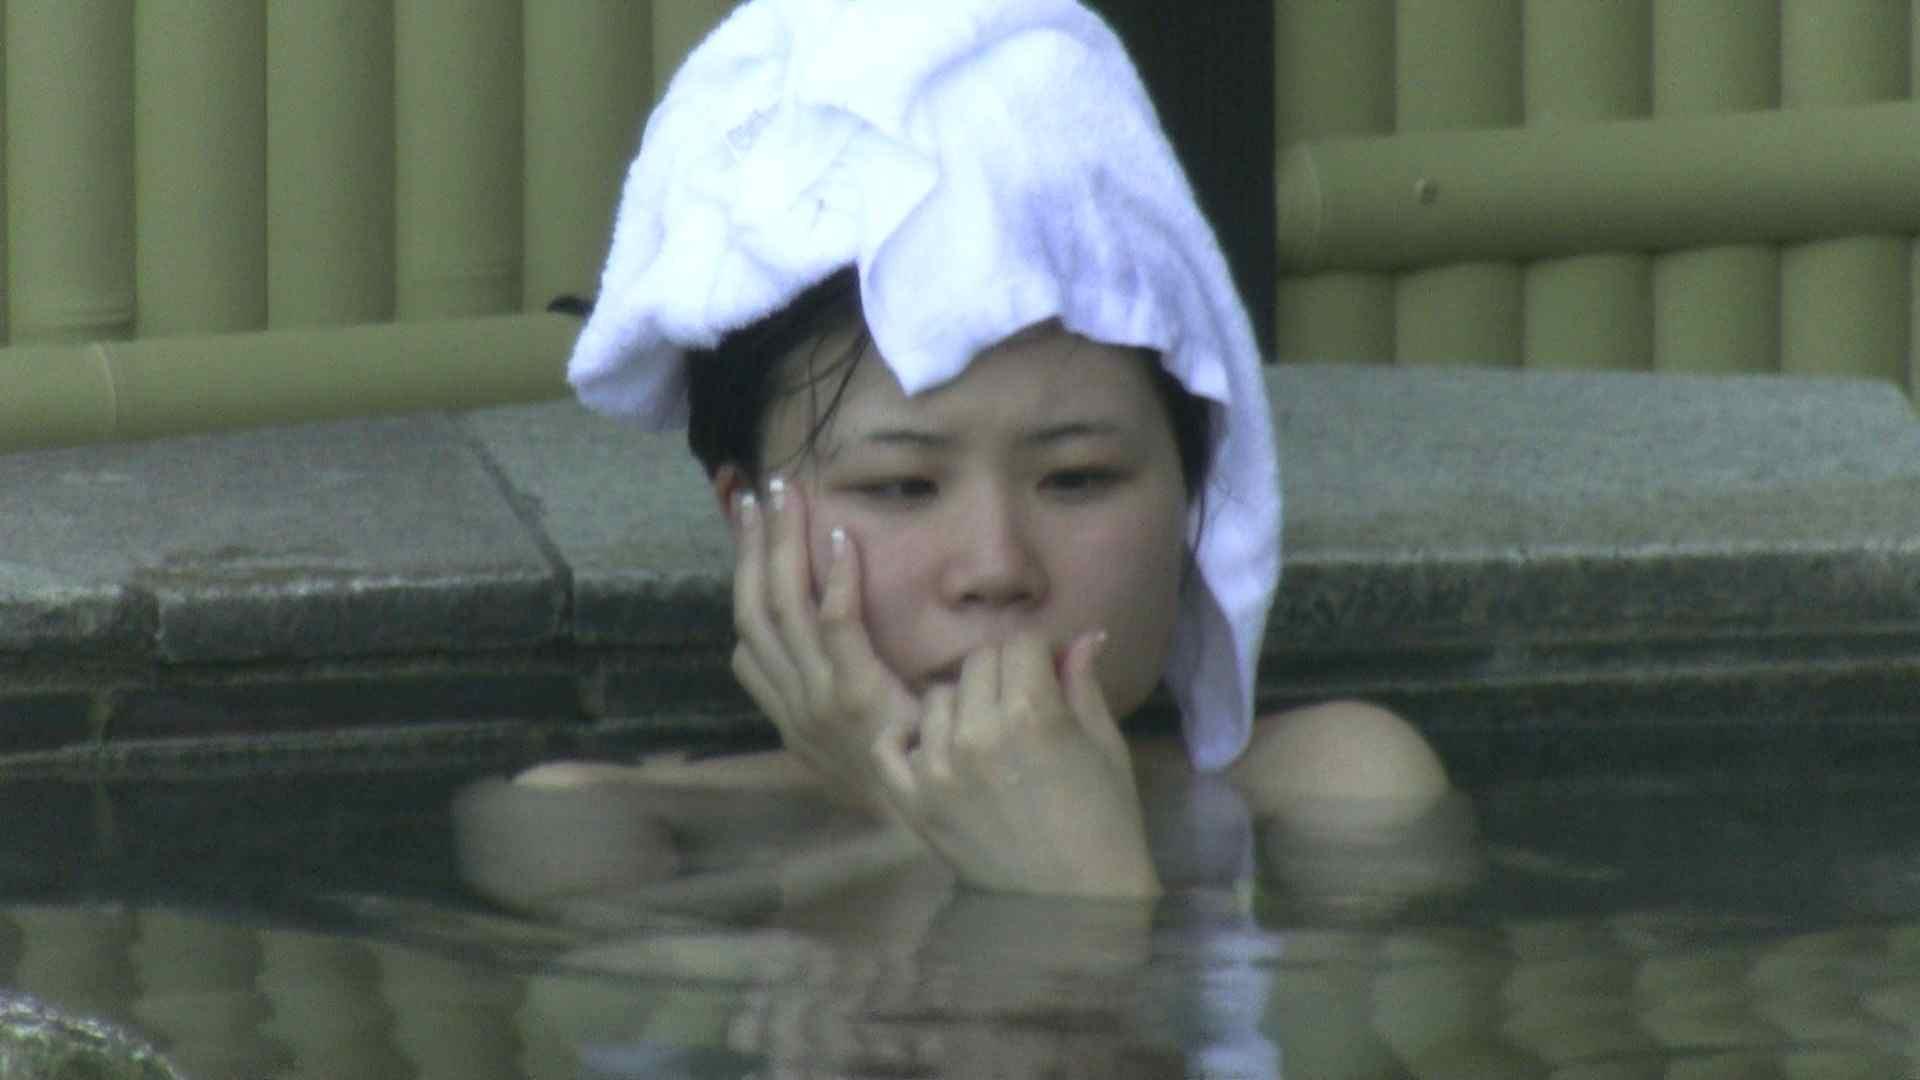 Aquaな露天風呂Vol.183 盗撮師作品 エロ無料画像 105pic 8